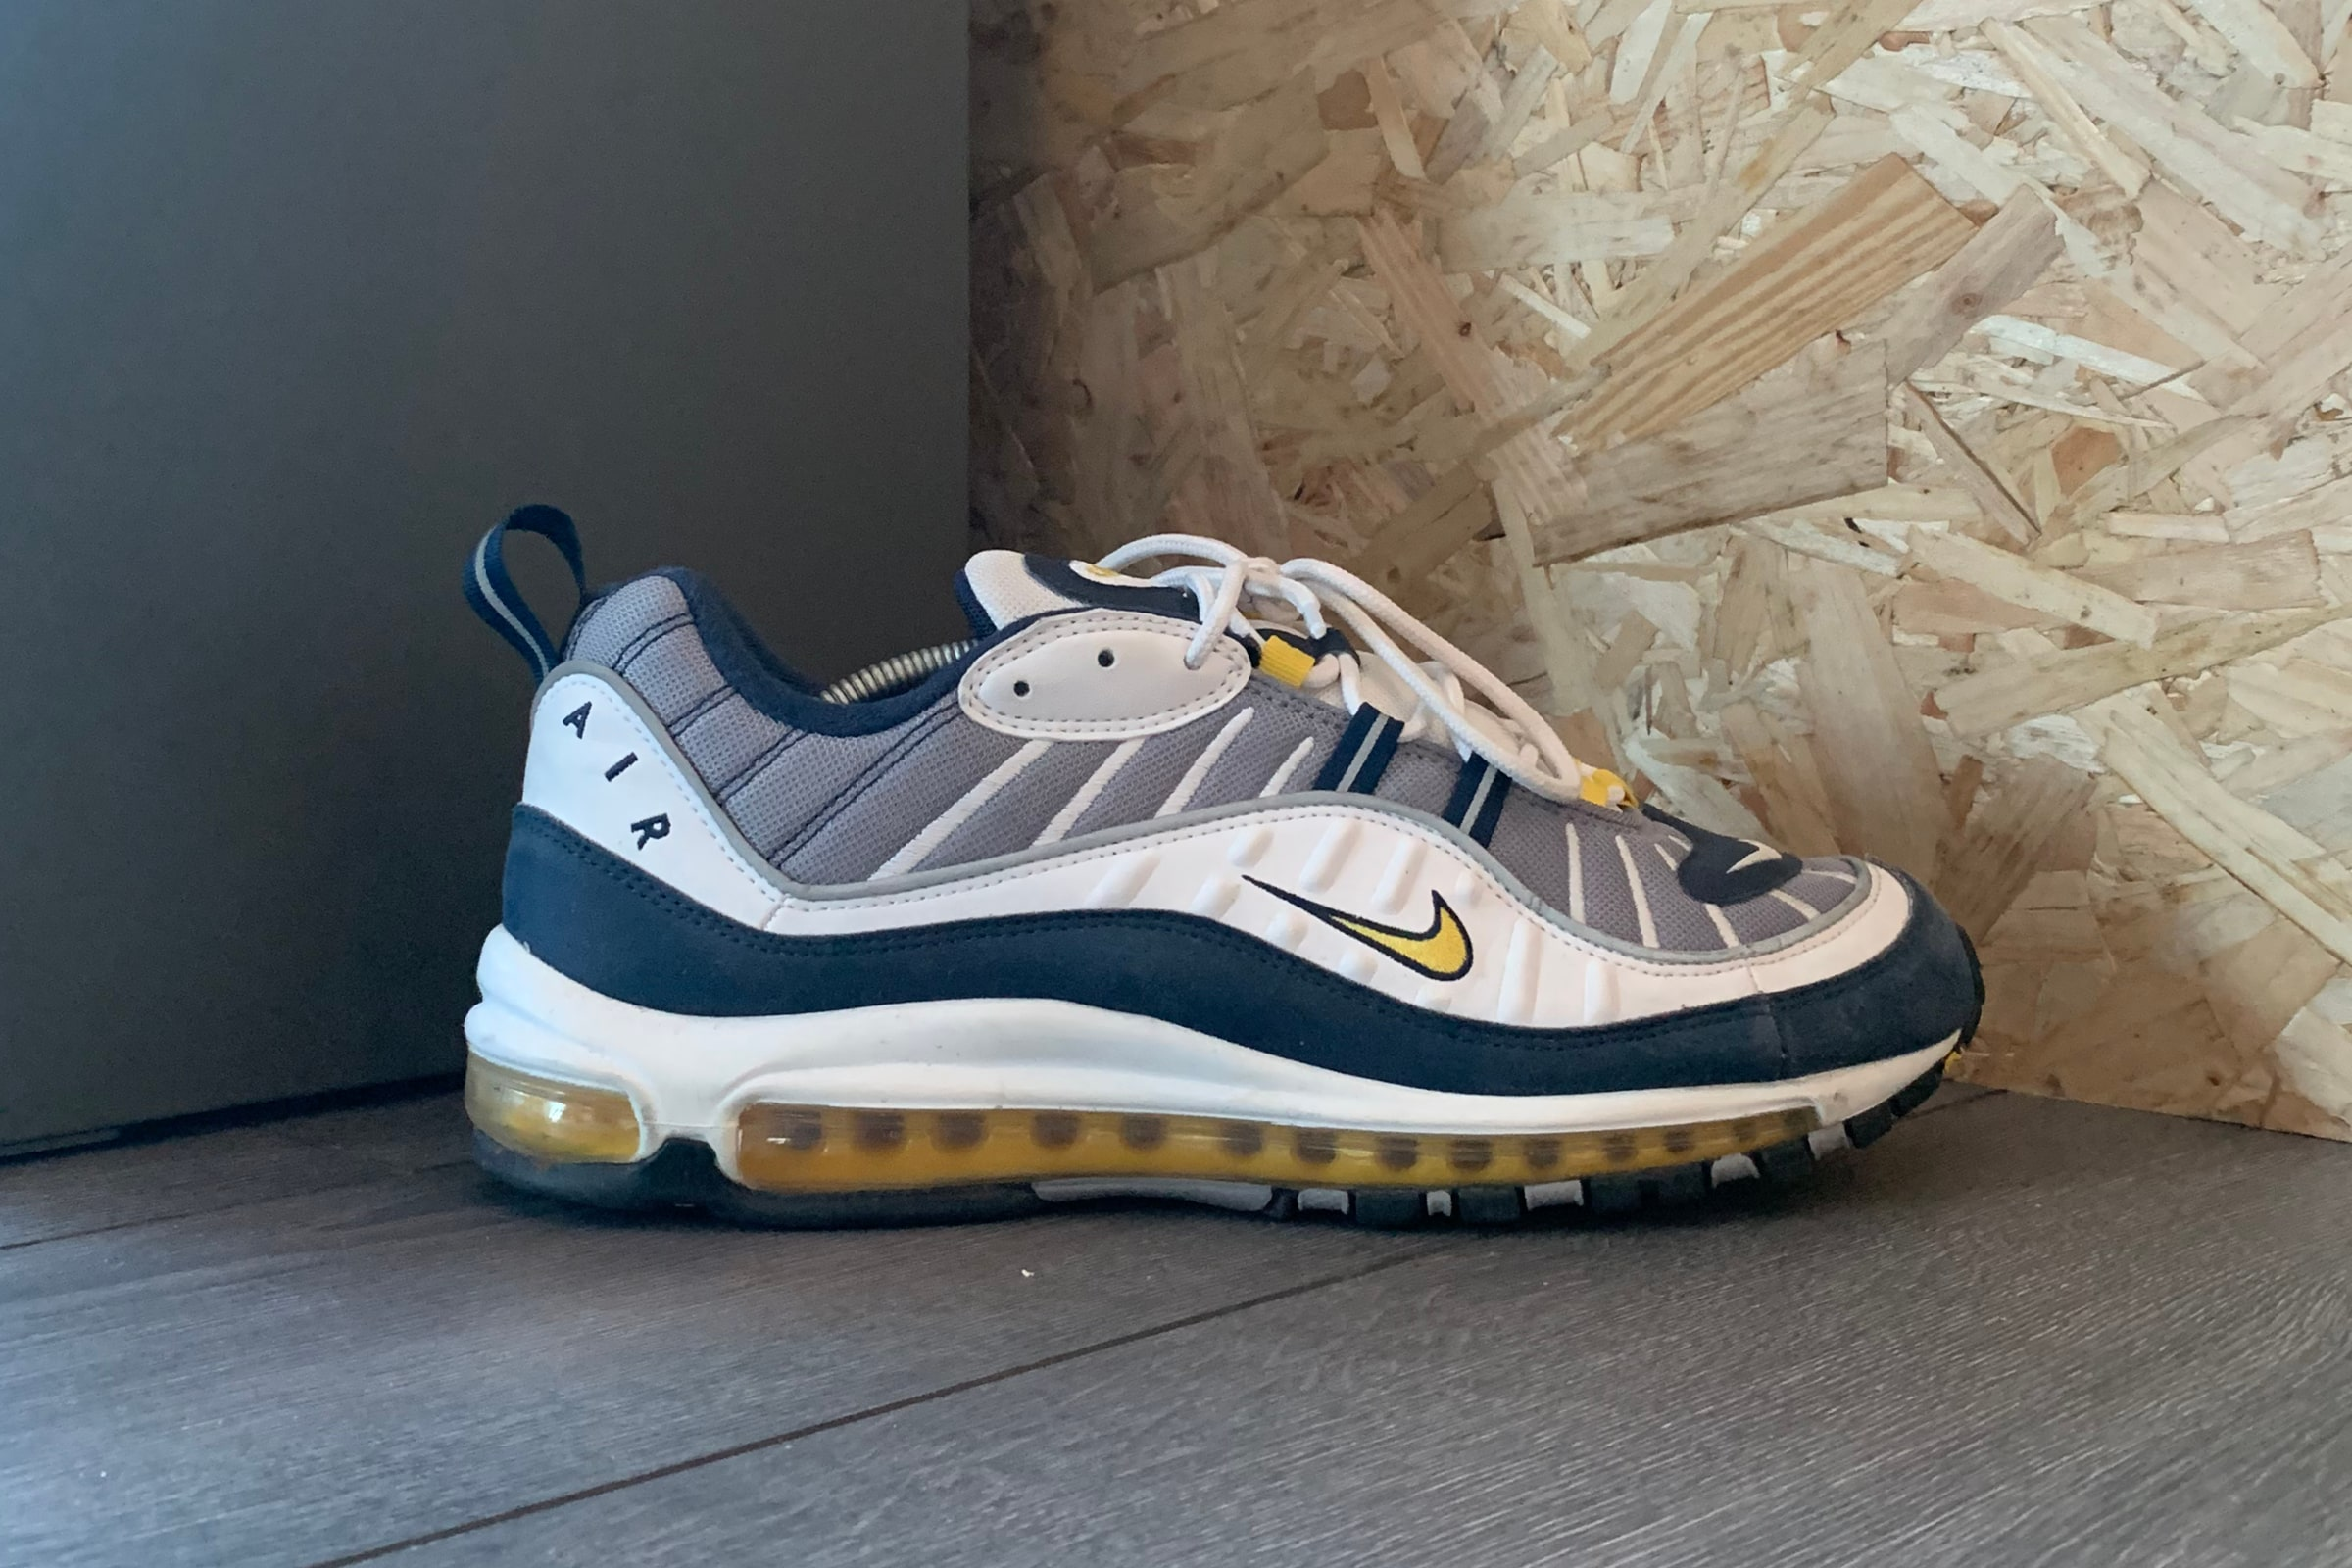 Nike Air Max 98 'Tour Yellow' - 2018